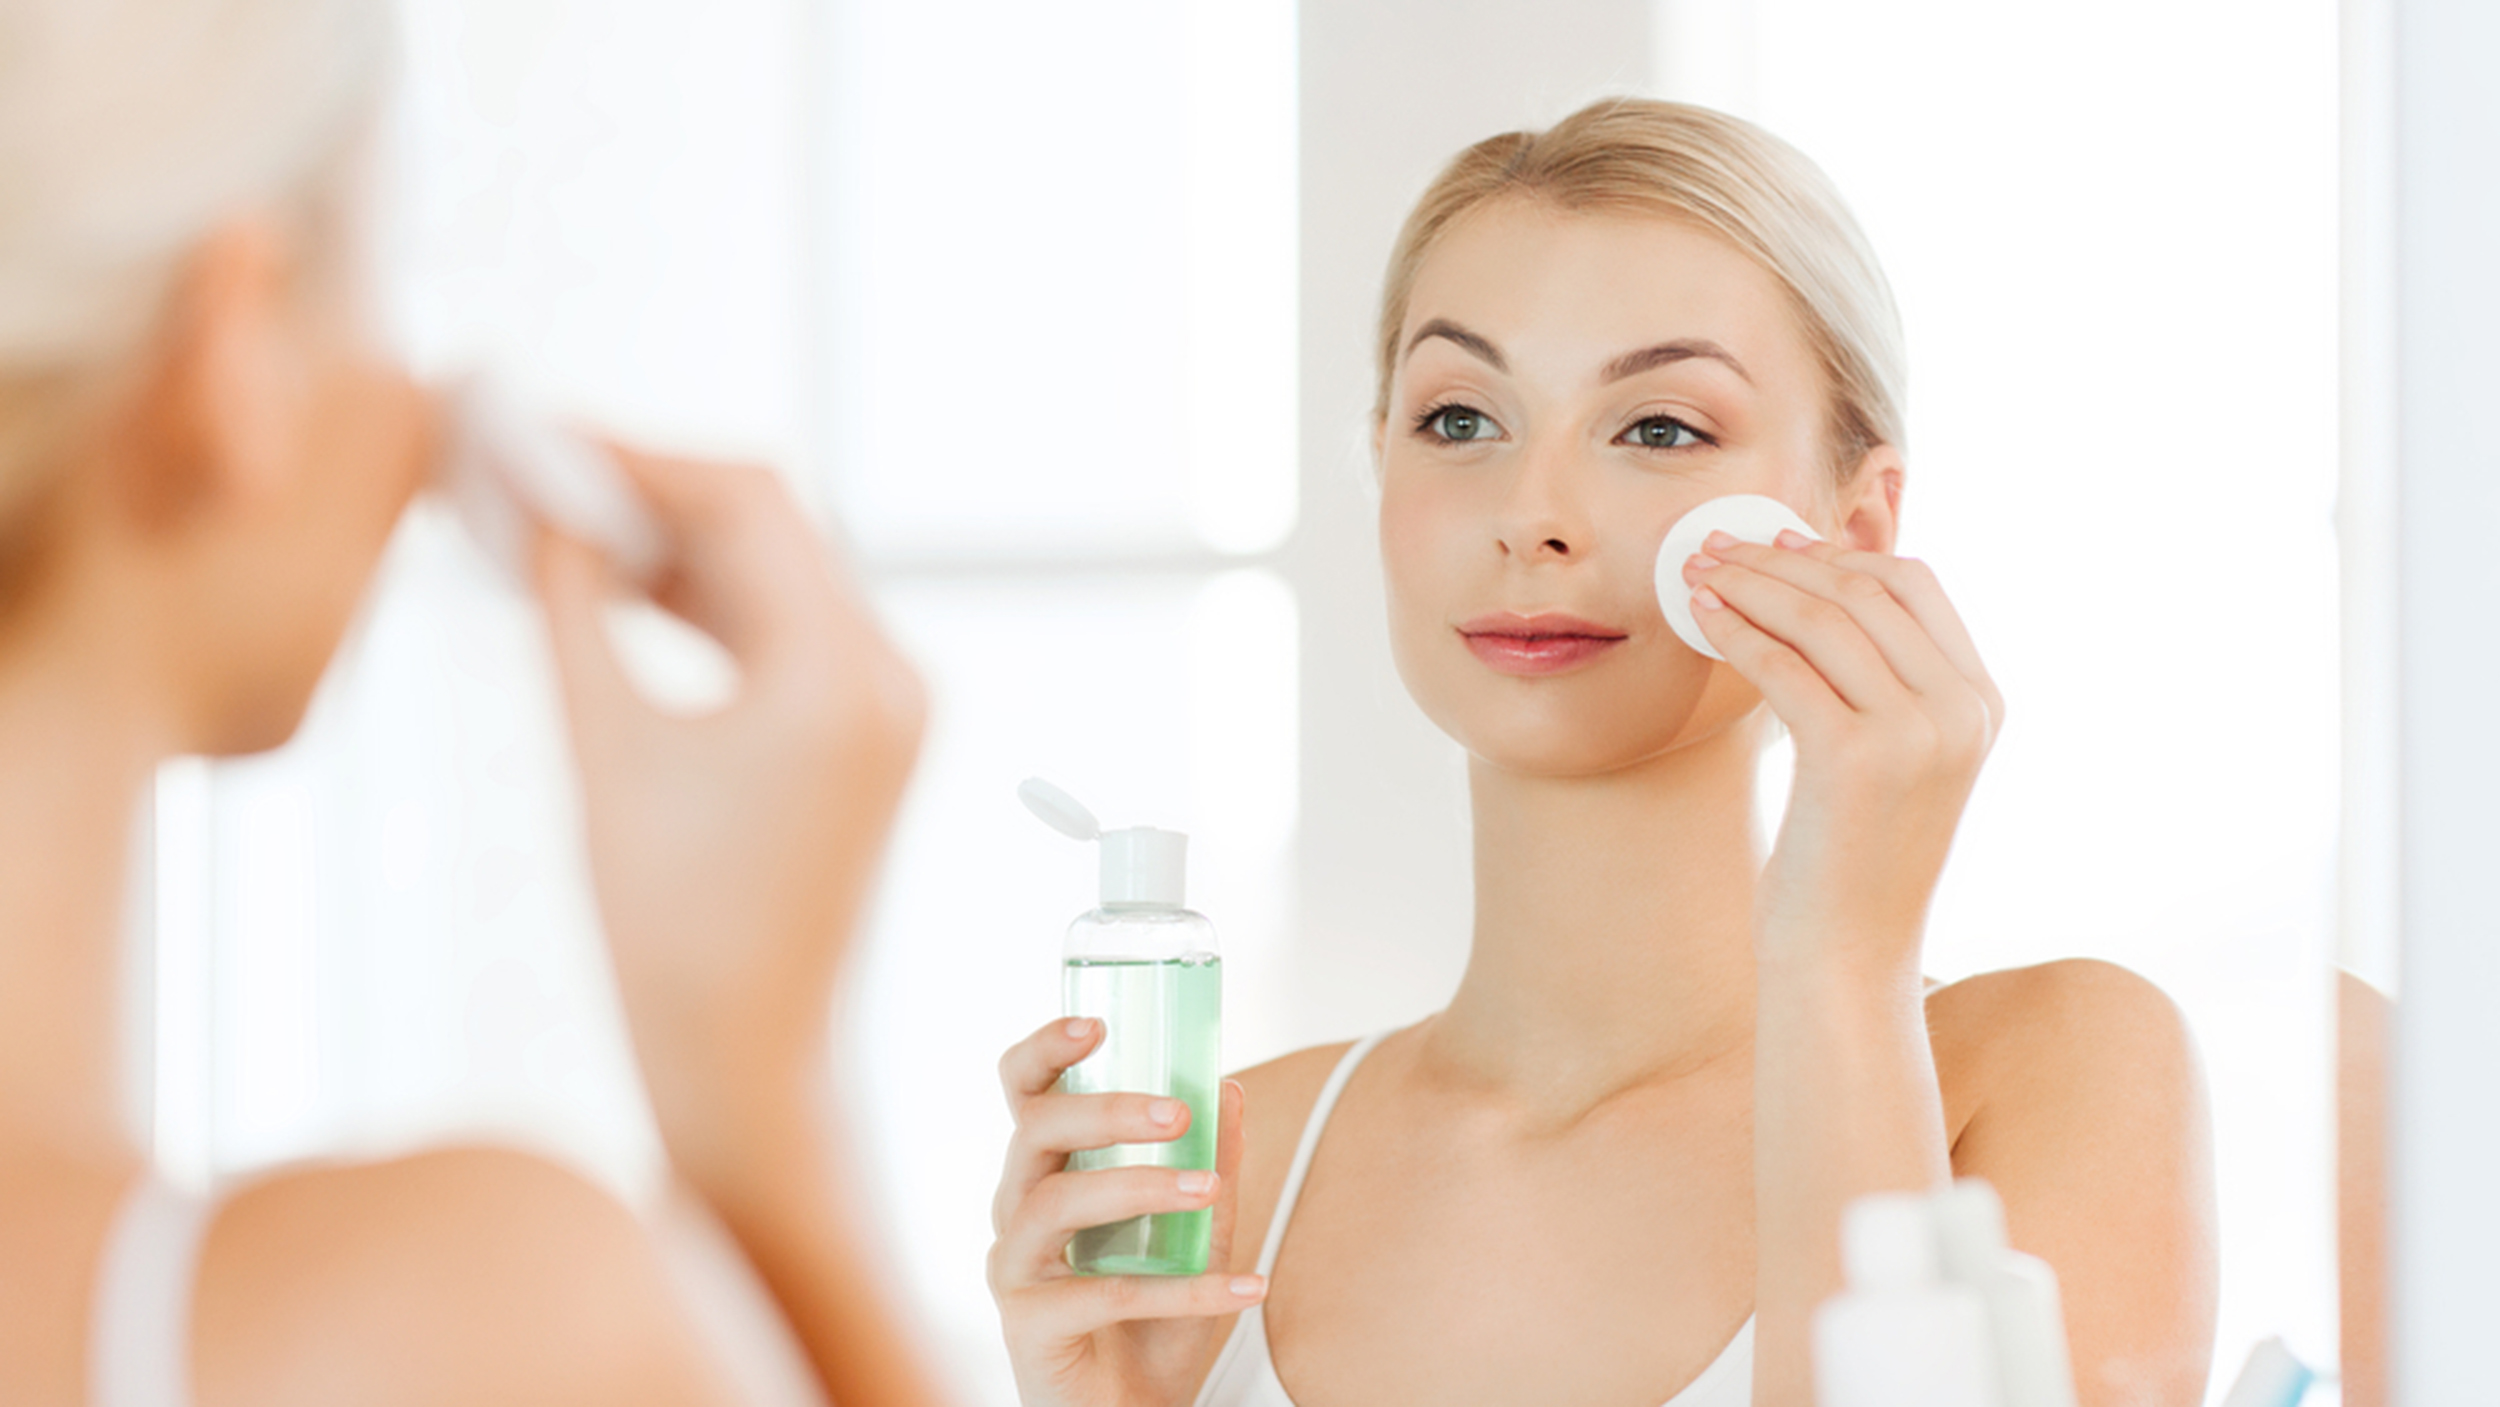 Color facial product woman